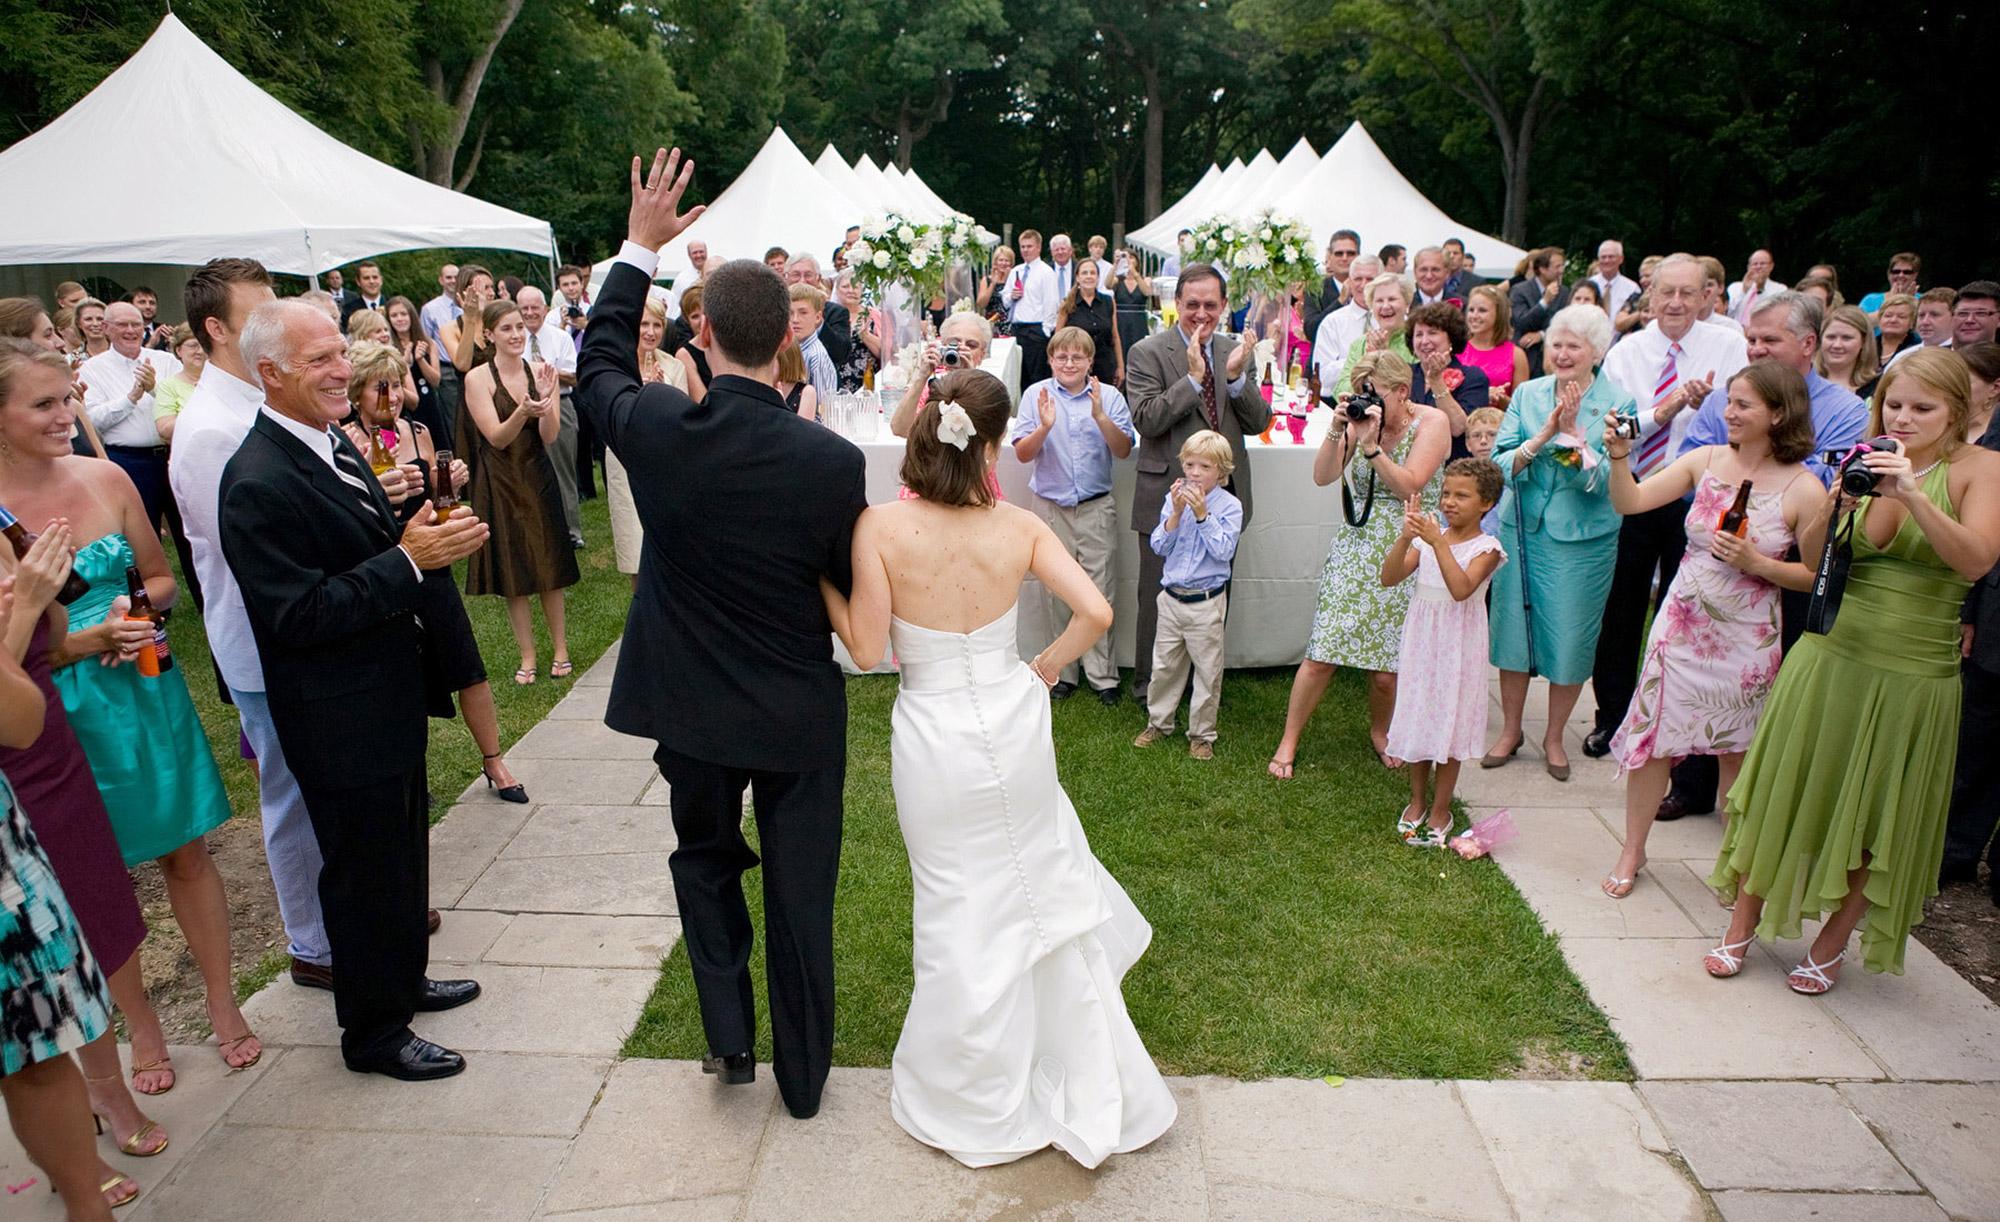 wedding-photography-saint-paul-mark-kegans-639.jpg